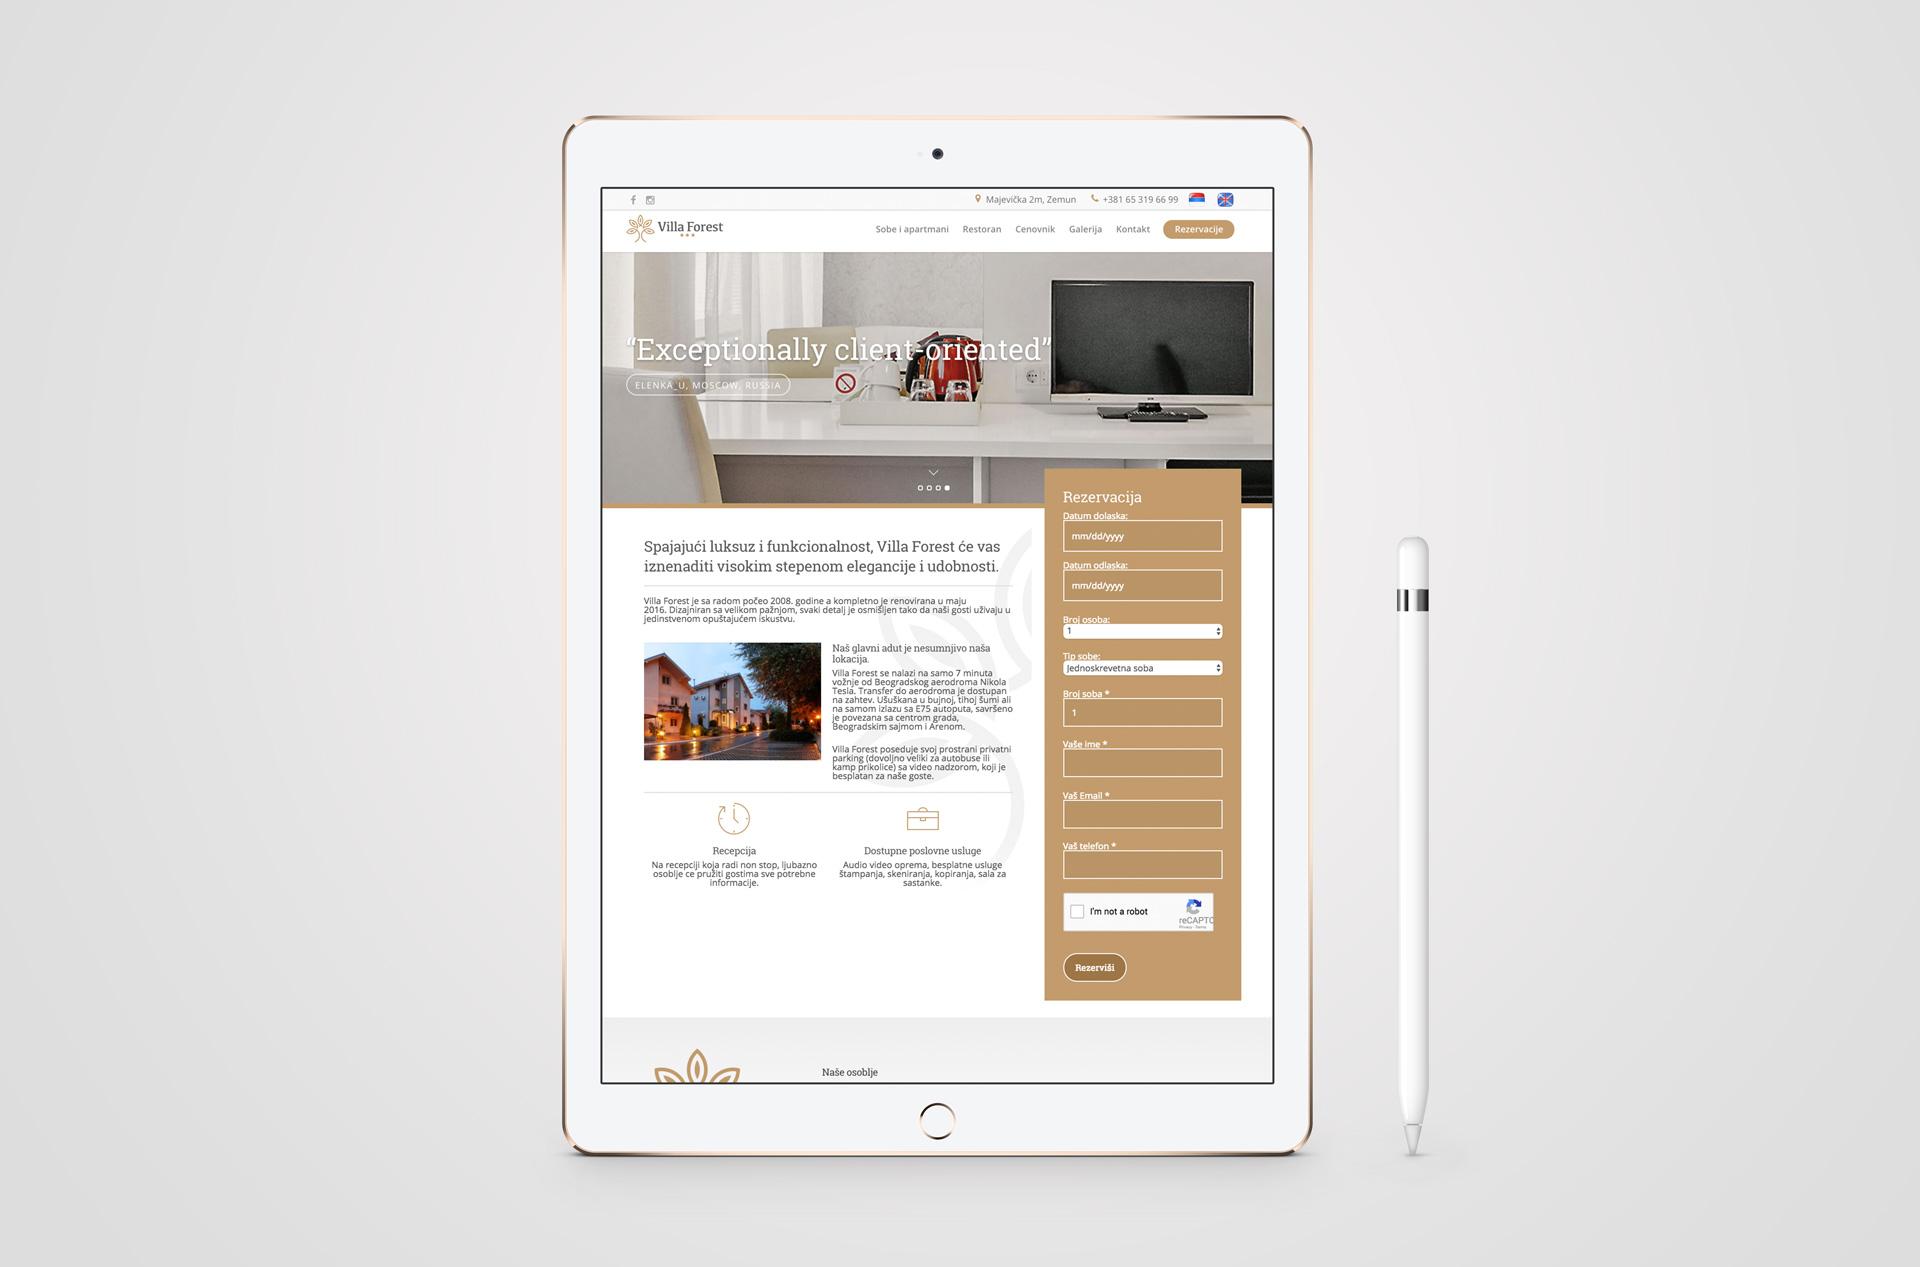 Dizajn responsive web sajta za hotel Villa Forest